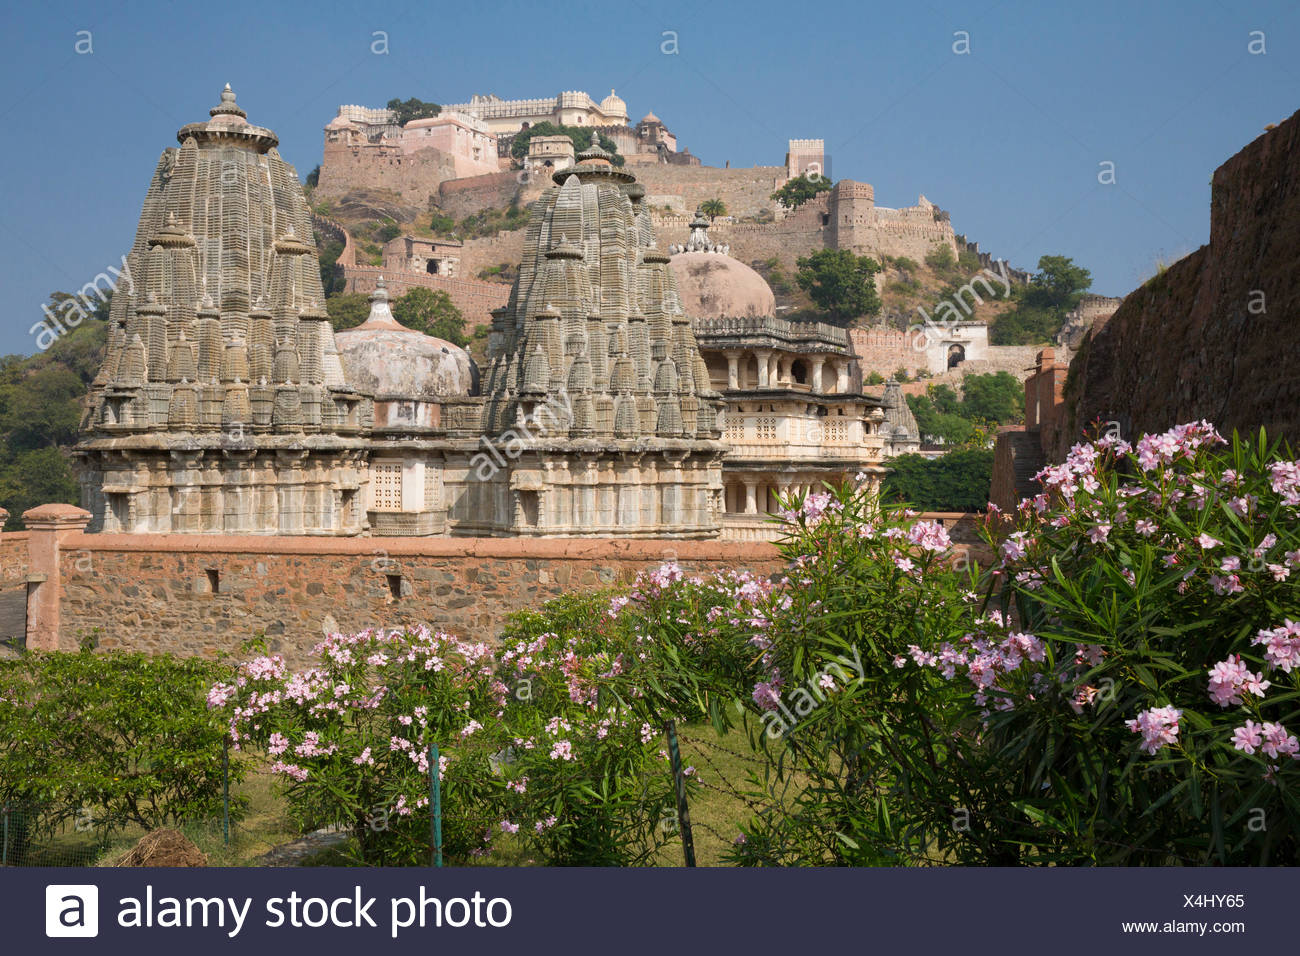 Fort, Kumbhalgarh, Rajasthan, wall, framed, Asia, India, - Stock Image